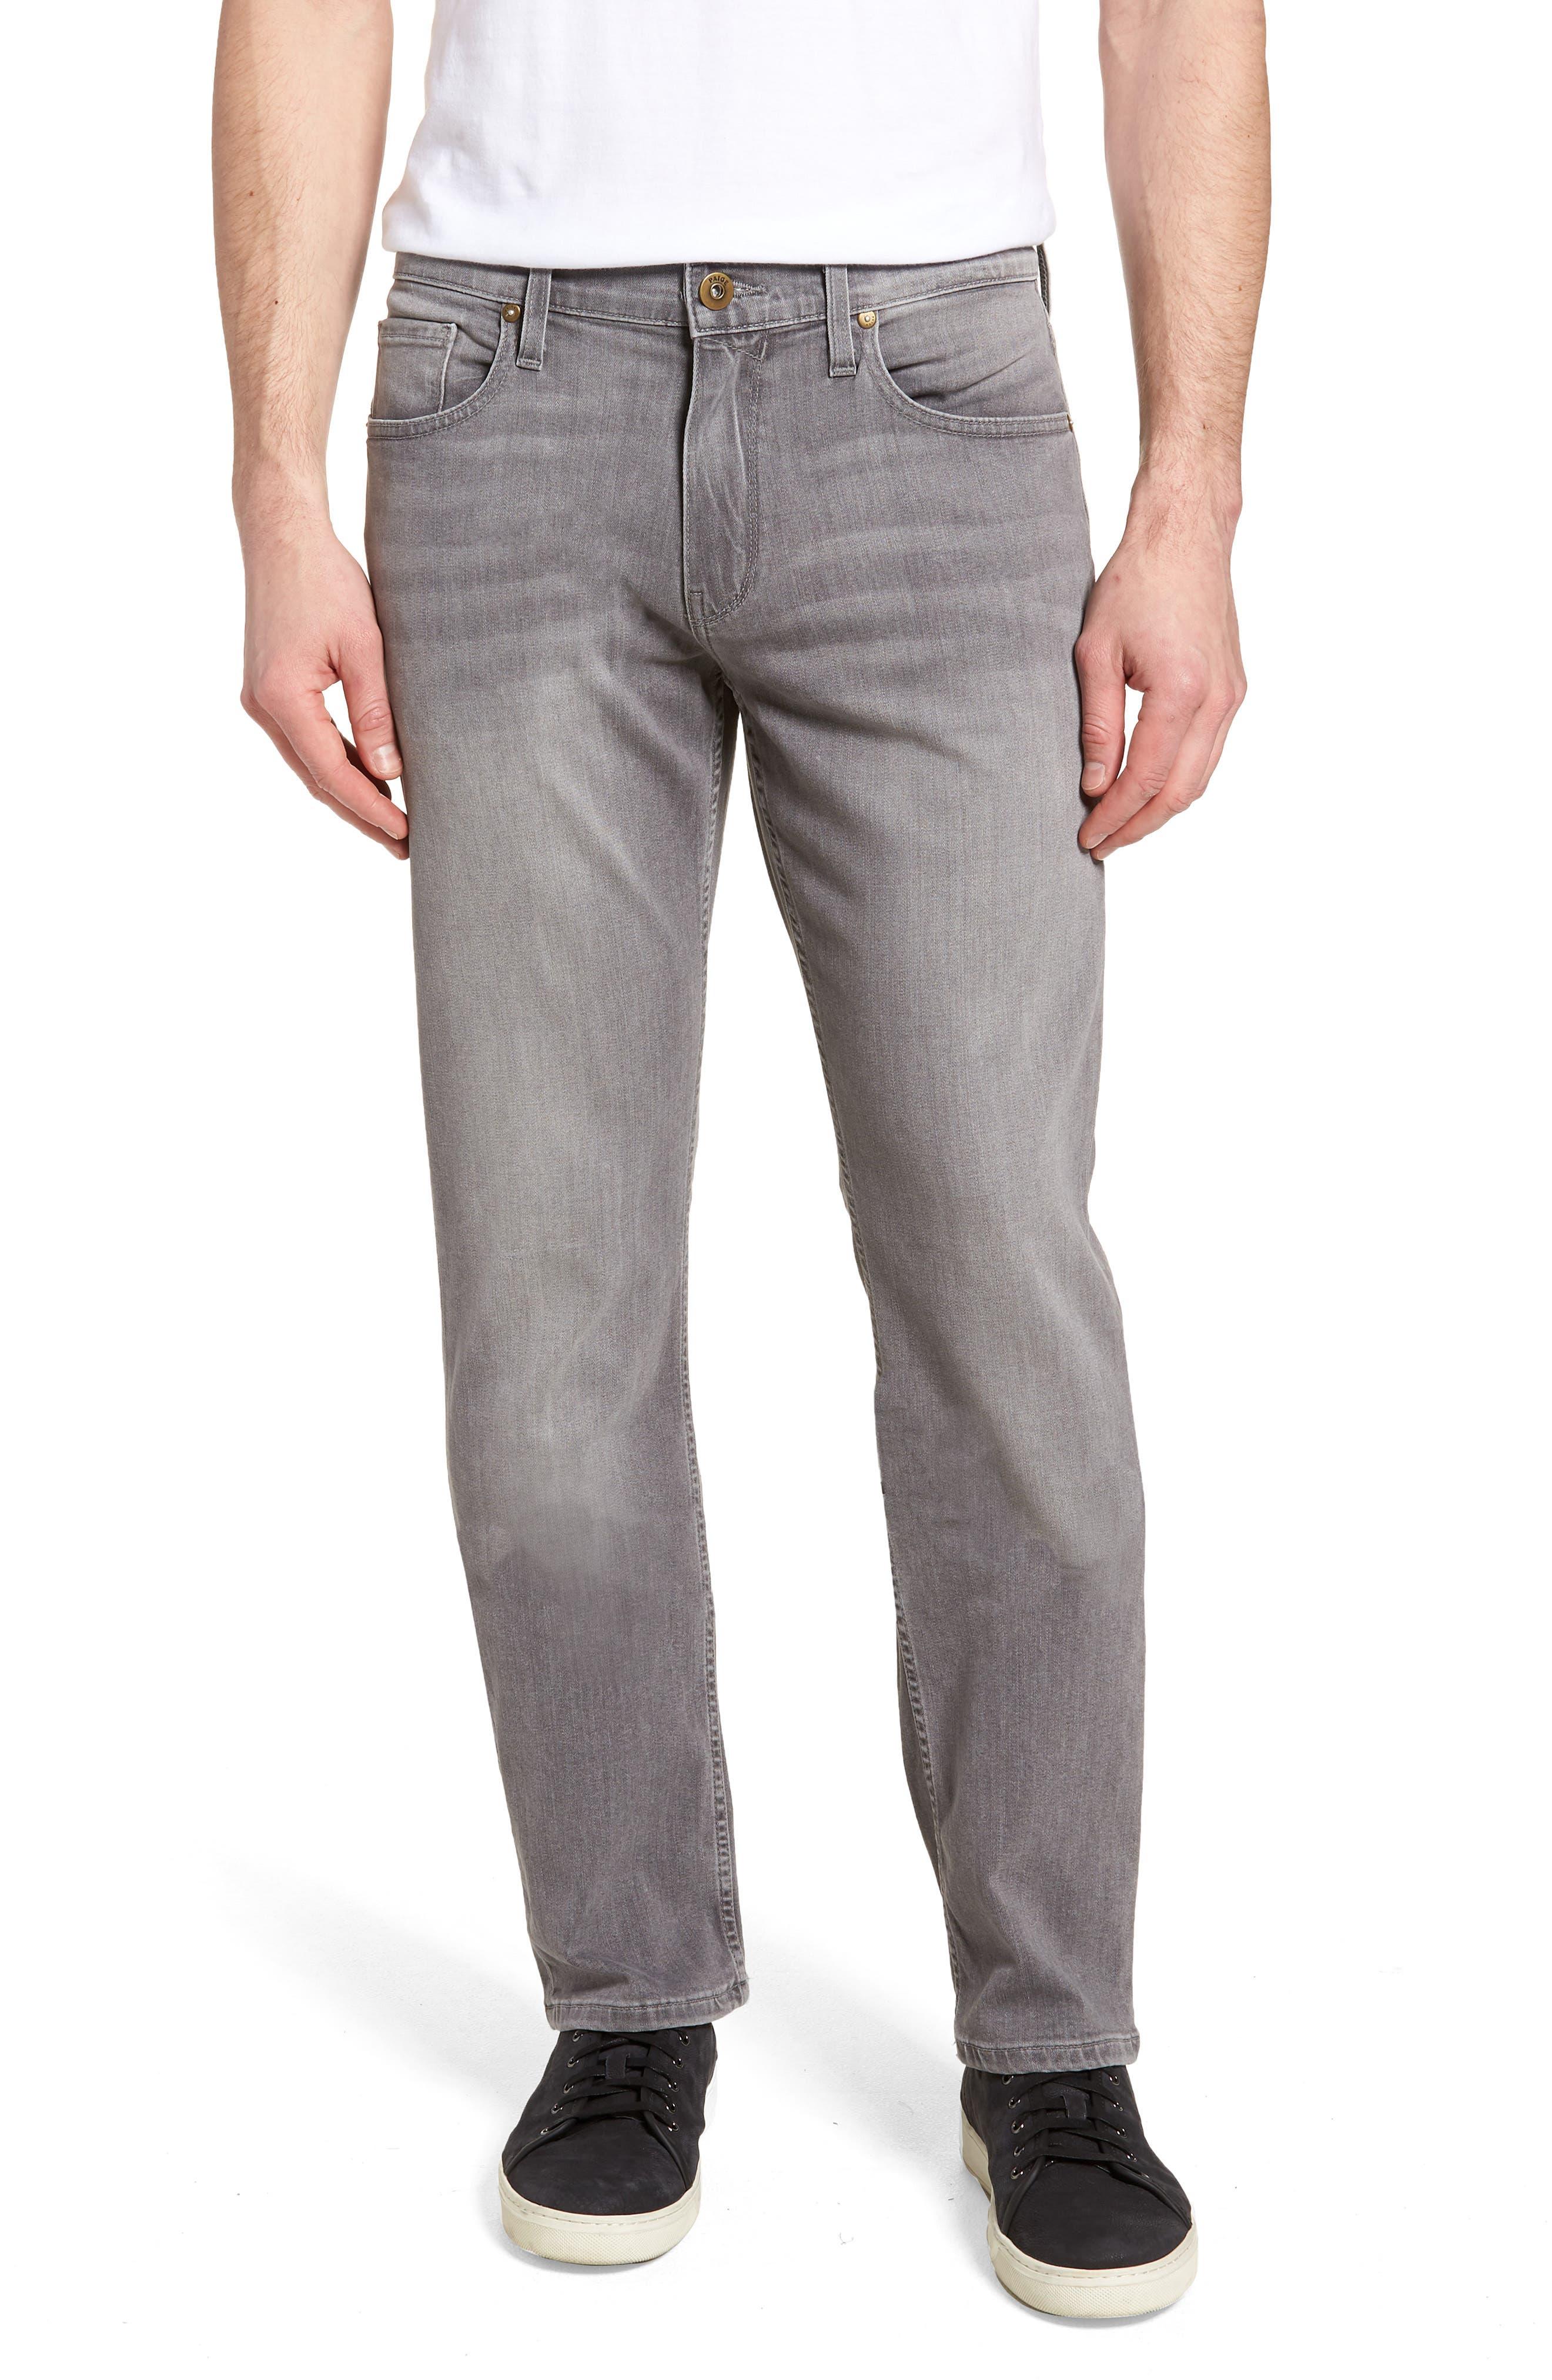 Normandie Straight Leg Jeans,                             Main thumbnail 1, color,                             030